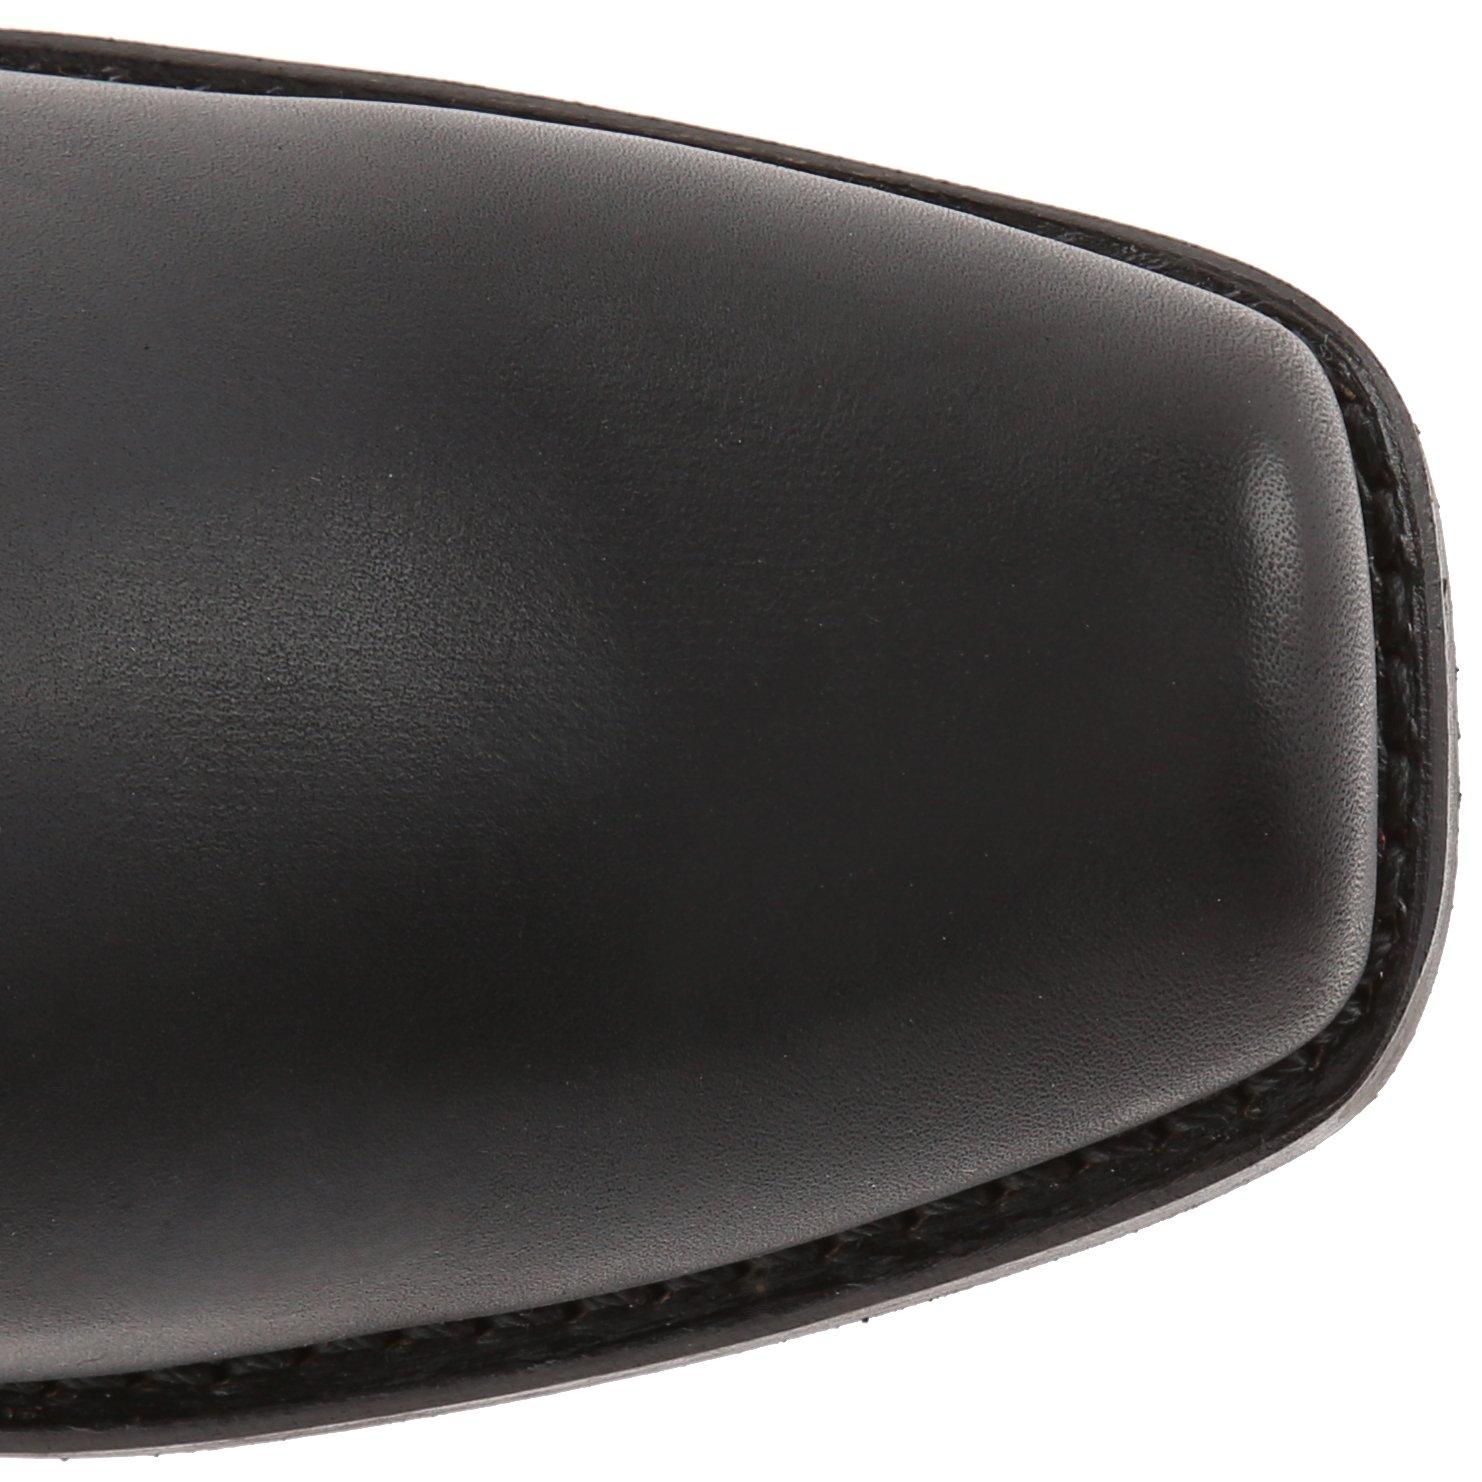 FRYE Women's B0013EXRN4 Harness 8R Boot B0013EXRN4 Women's 5.5 B(M) US Black-77455 46430c